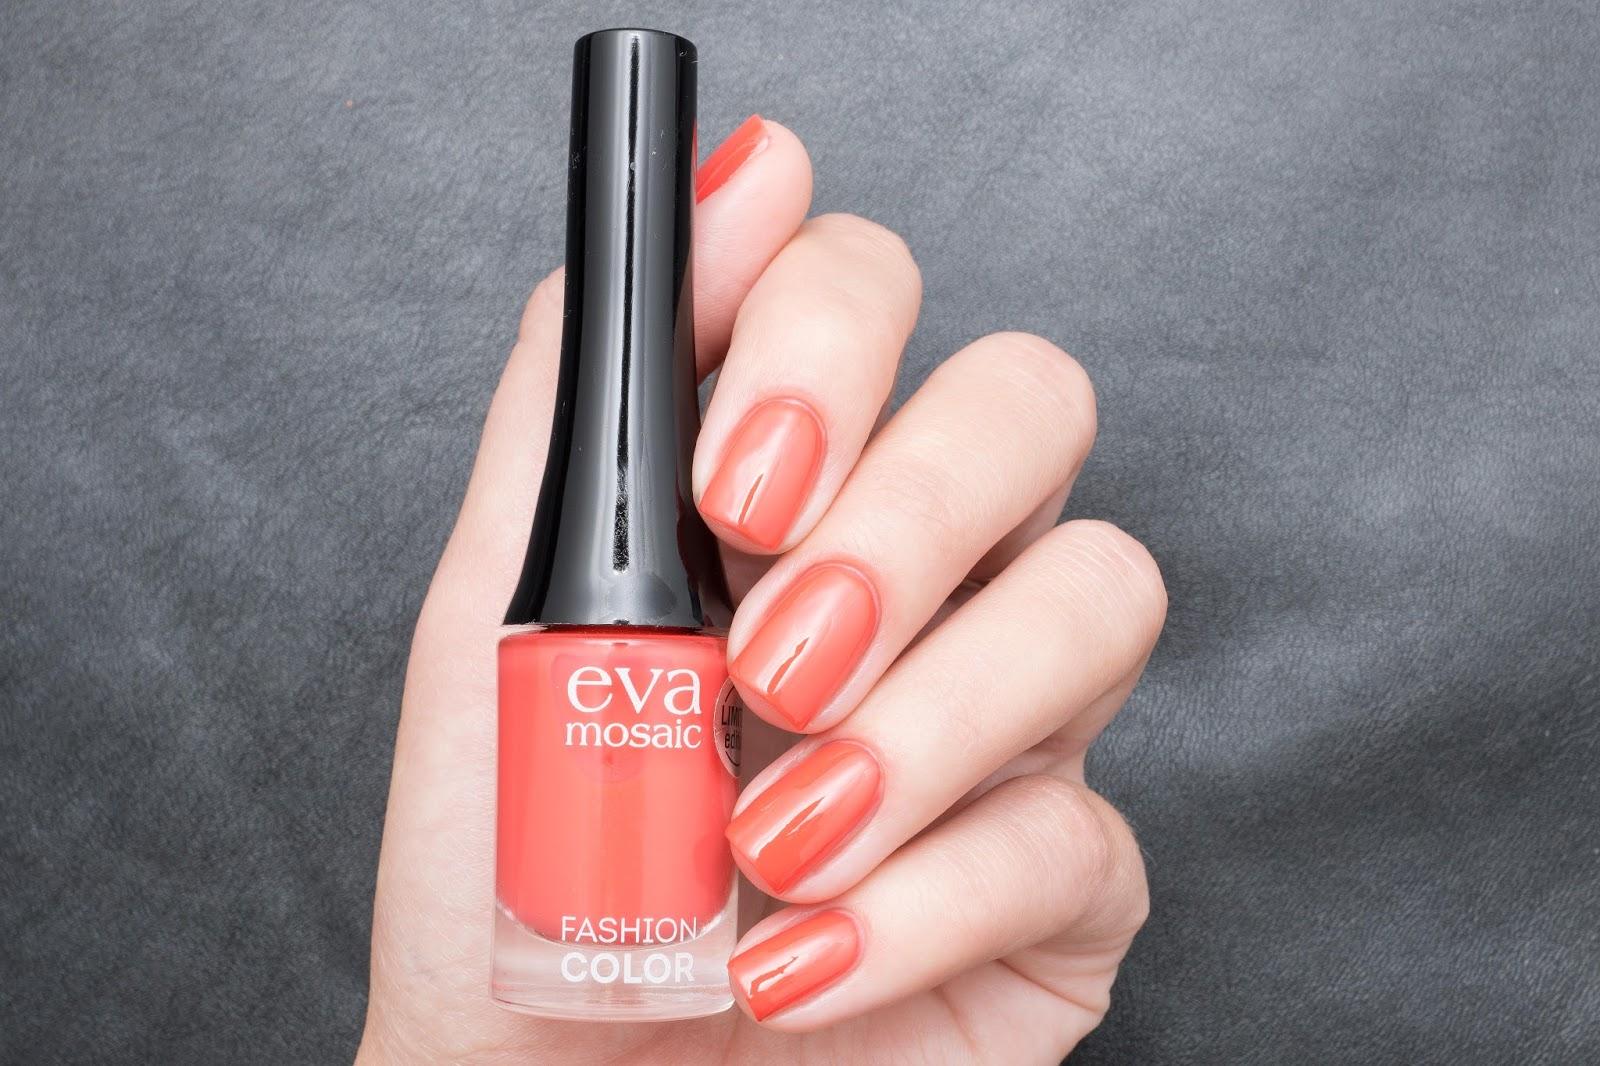 Eva fashion лак для ногтей